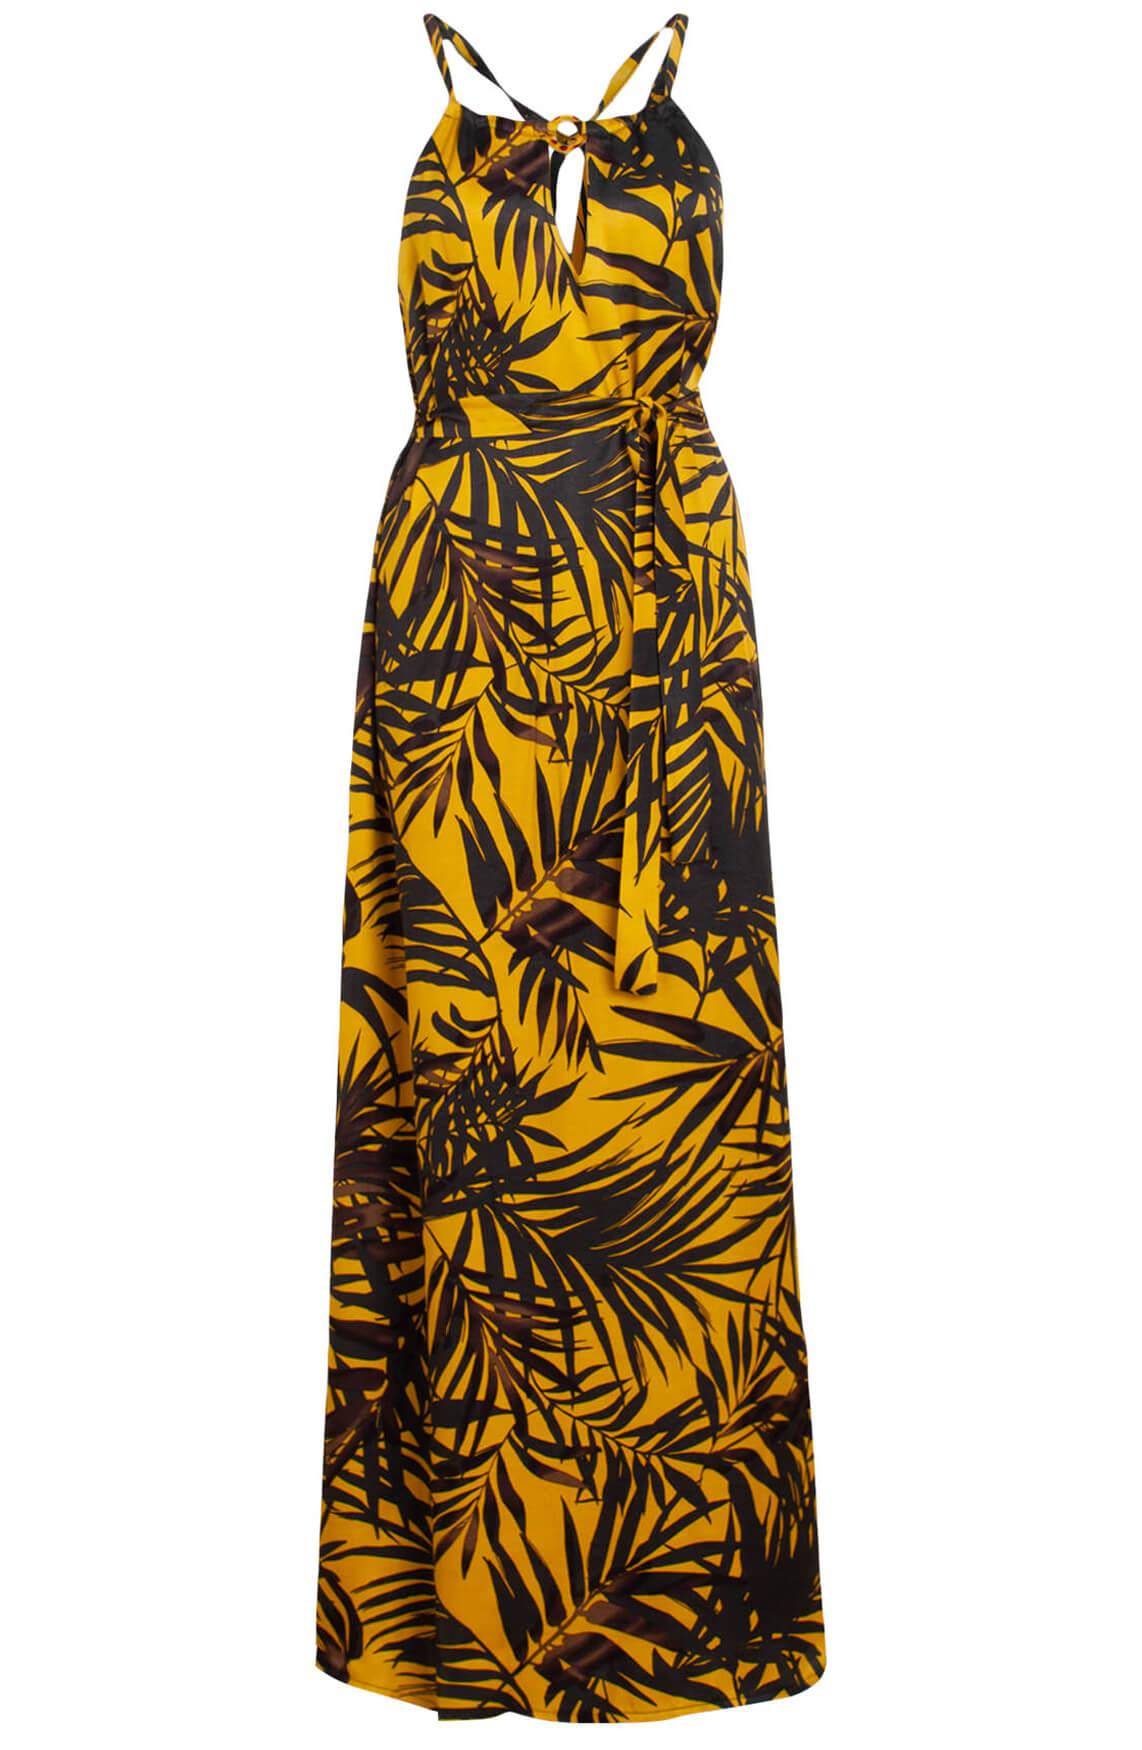 Ana Alcazar Dames Maxi jurk geel